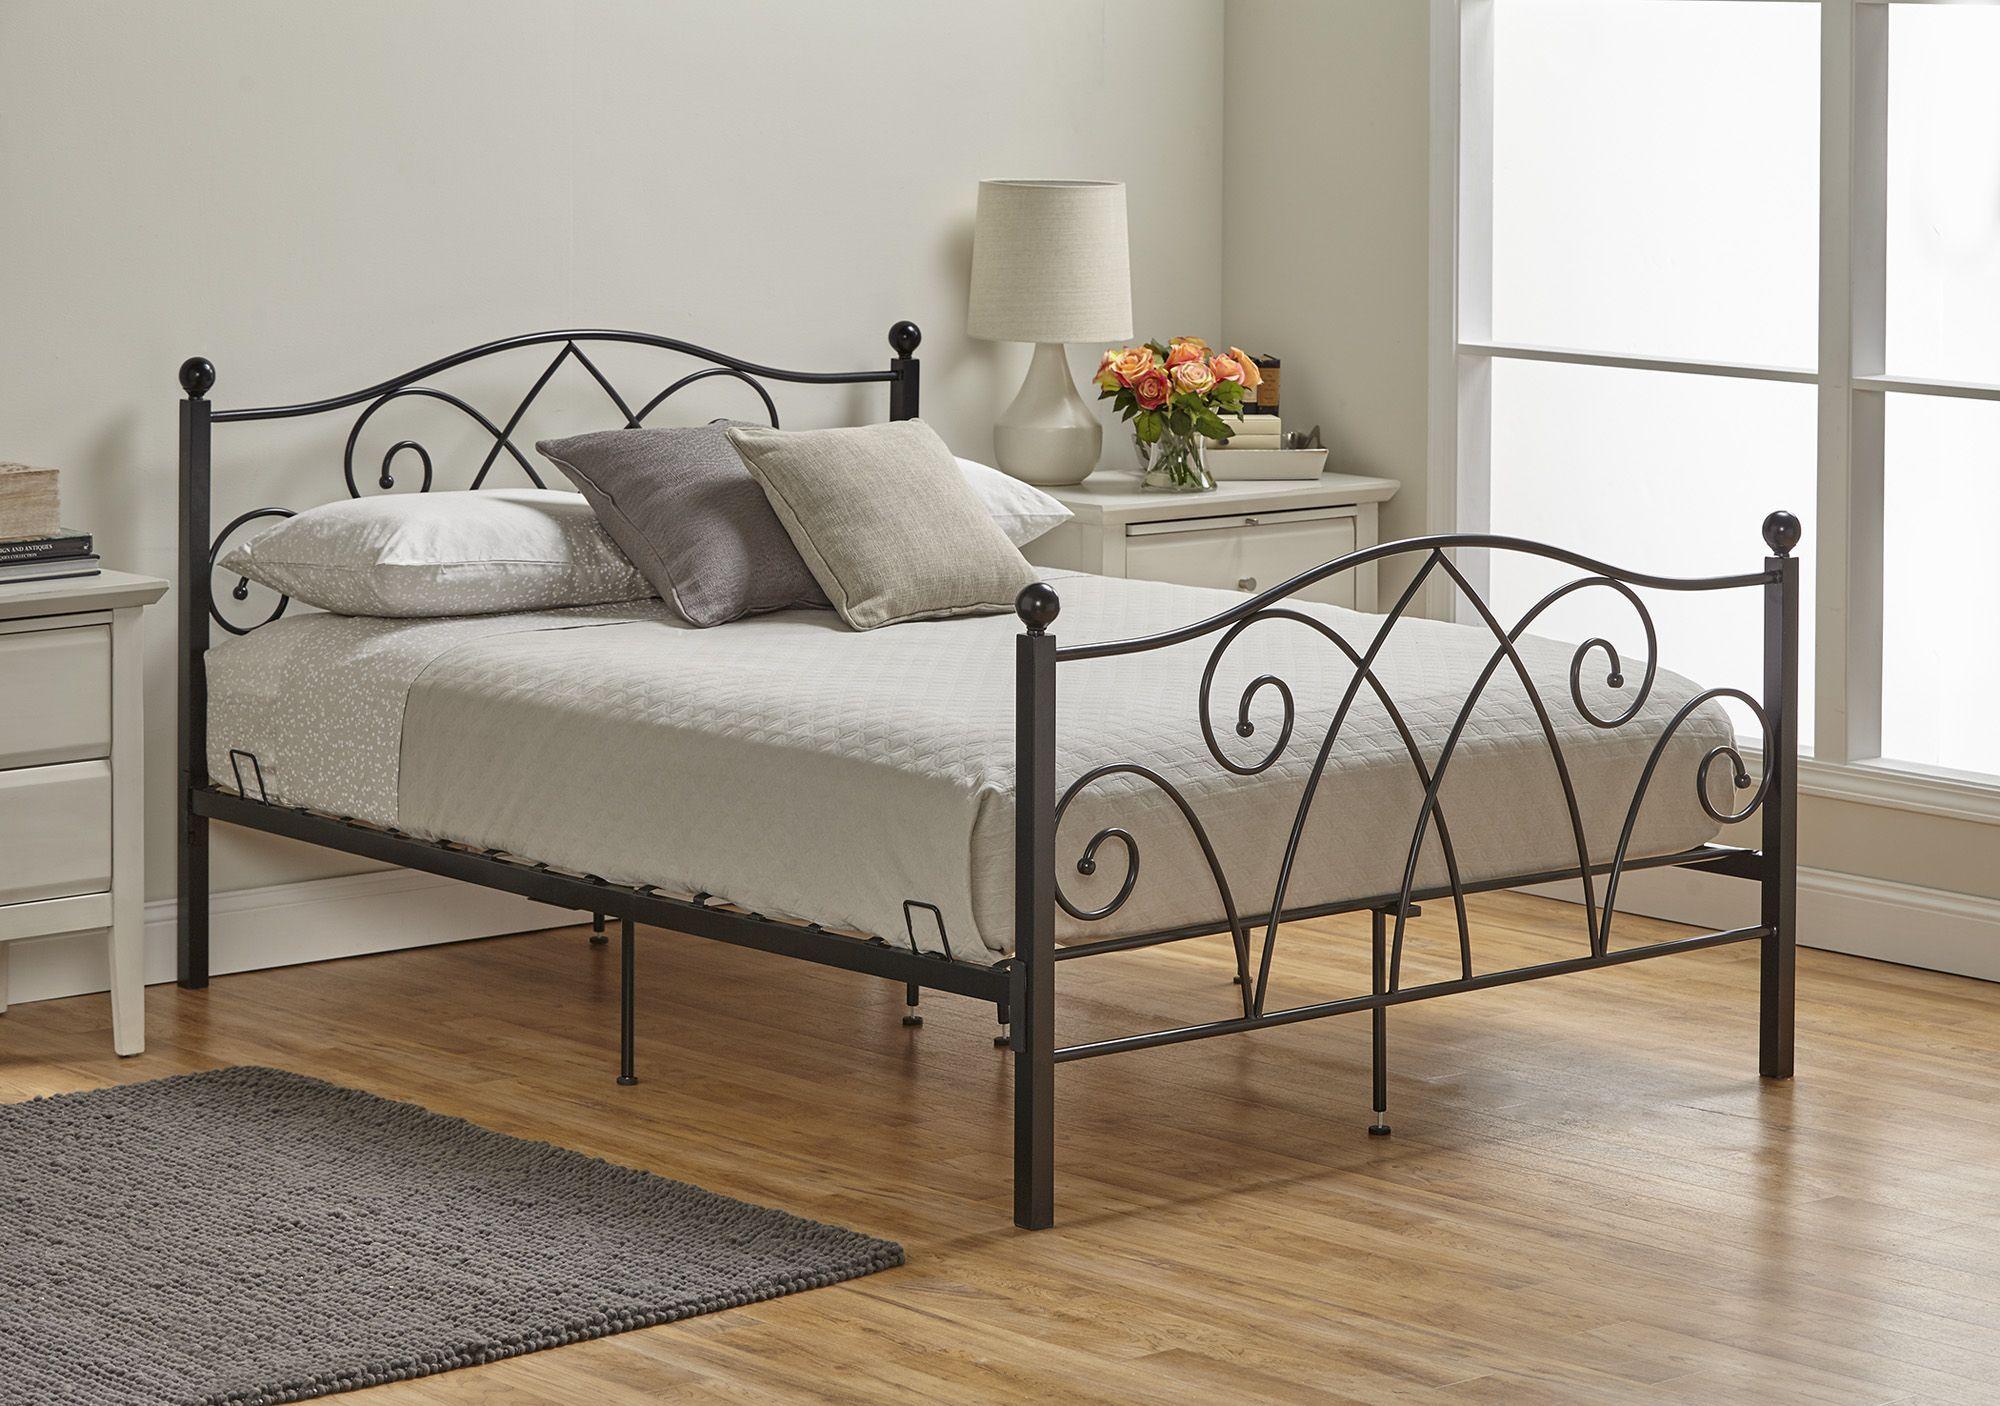 Fingerhut Alcove Boltzero Bed Full Full Bed Bed Home Decor